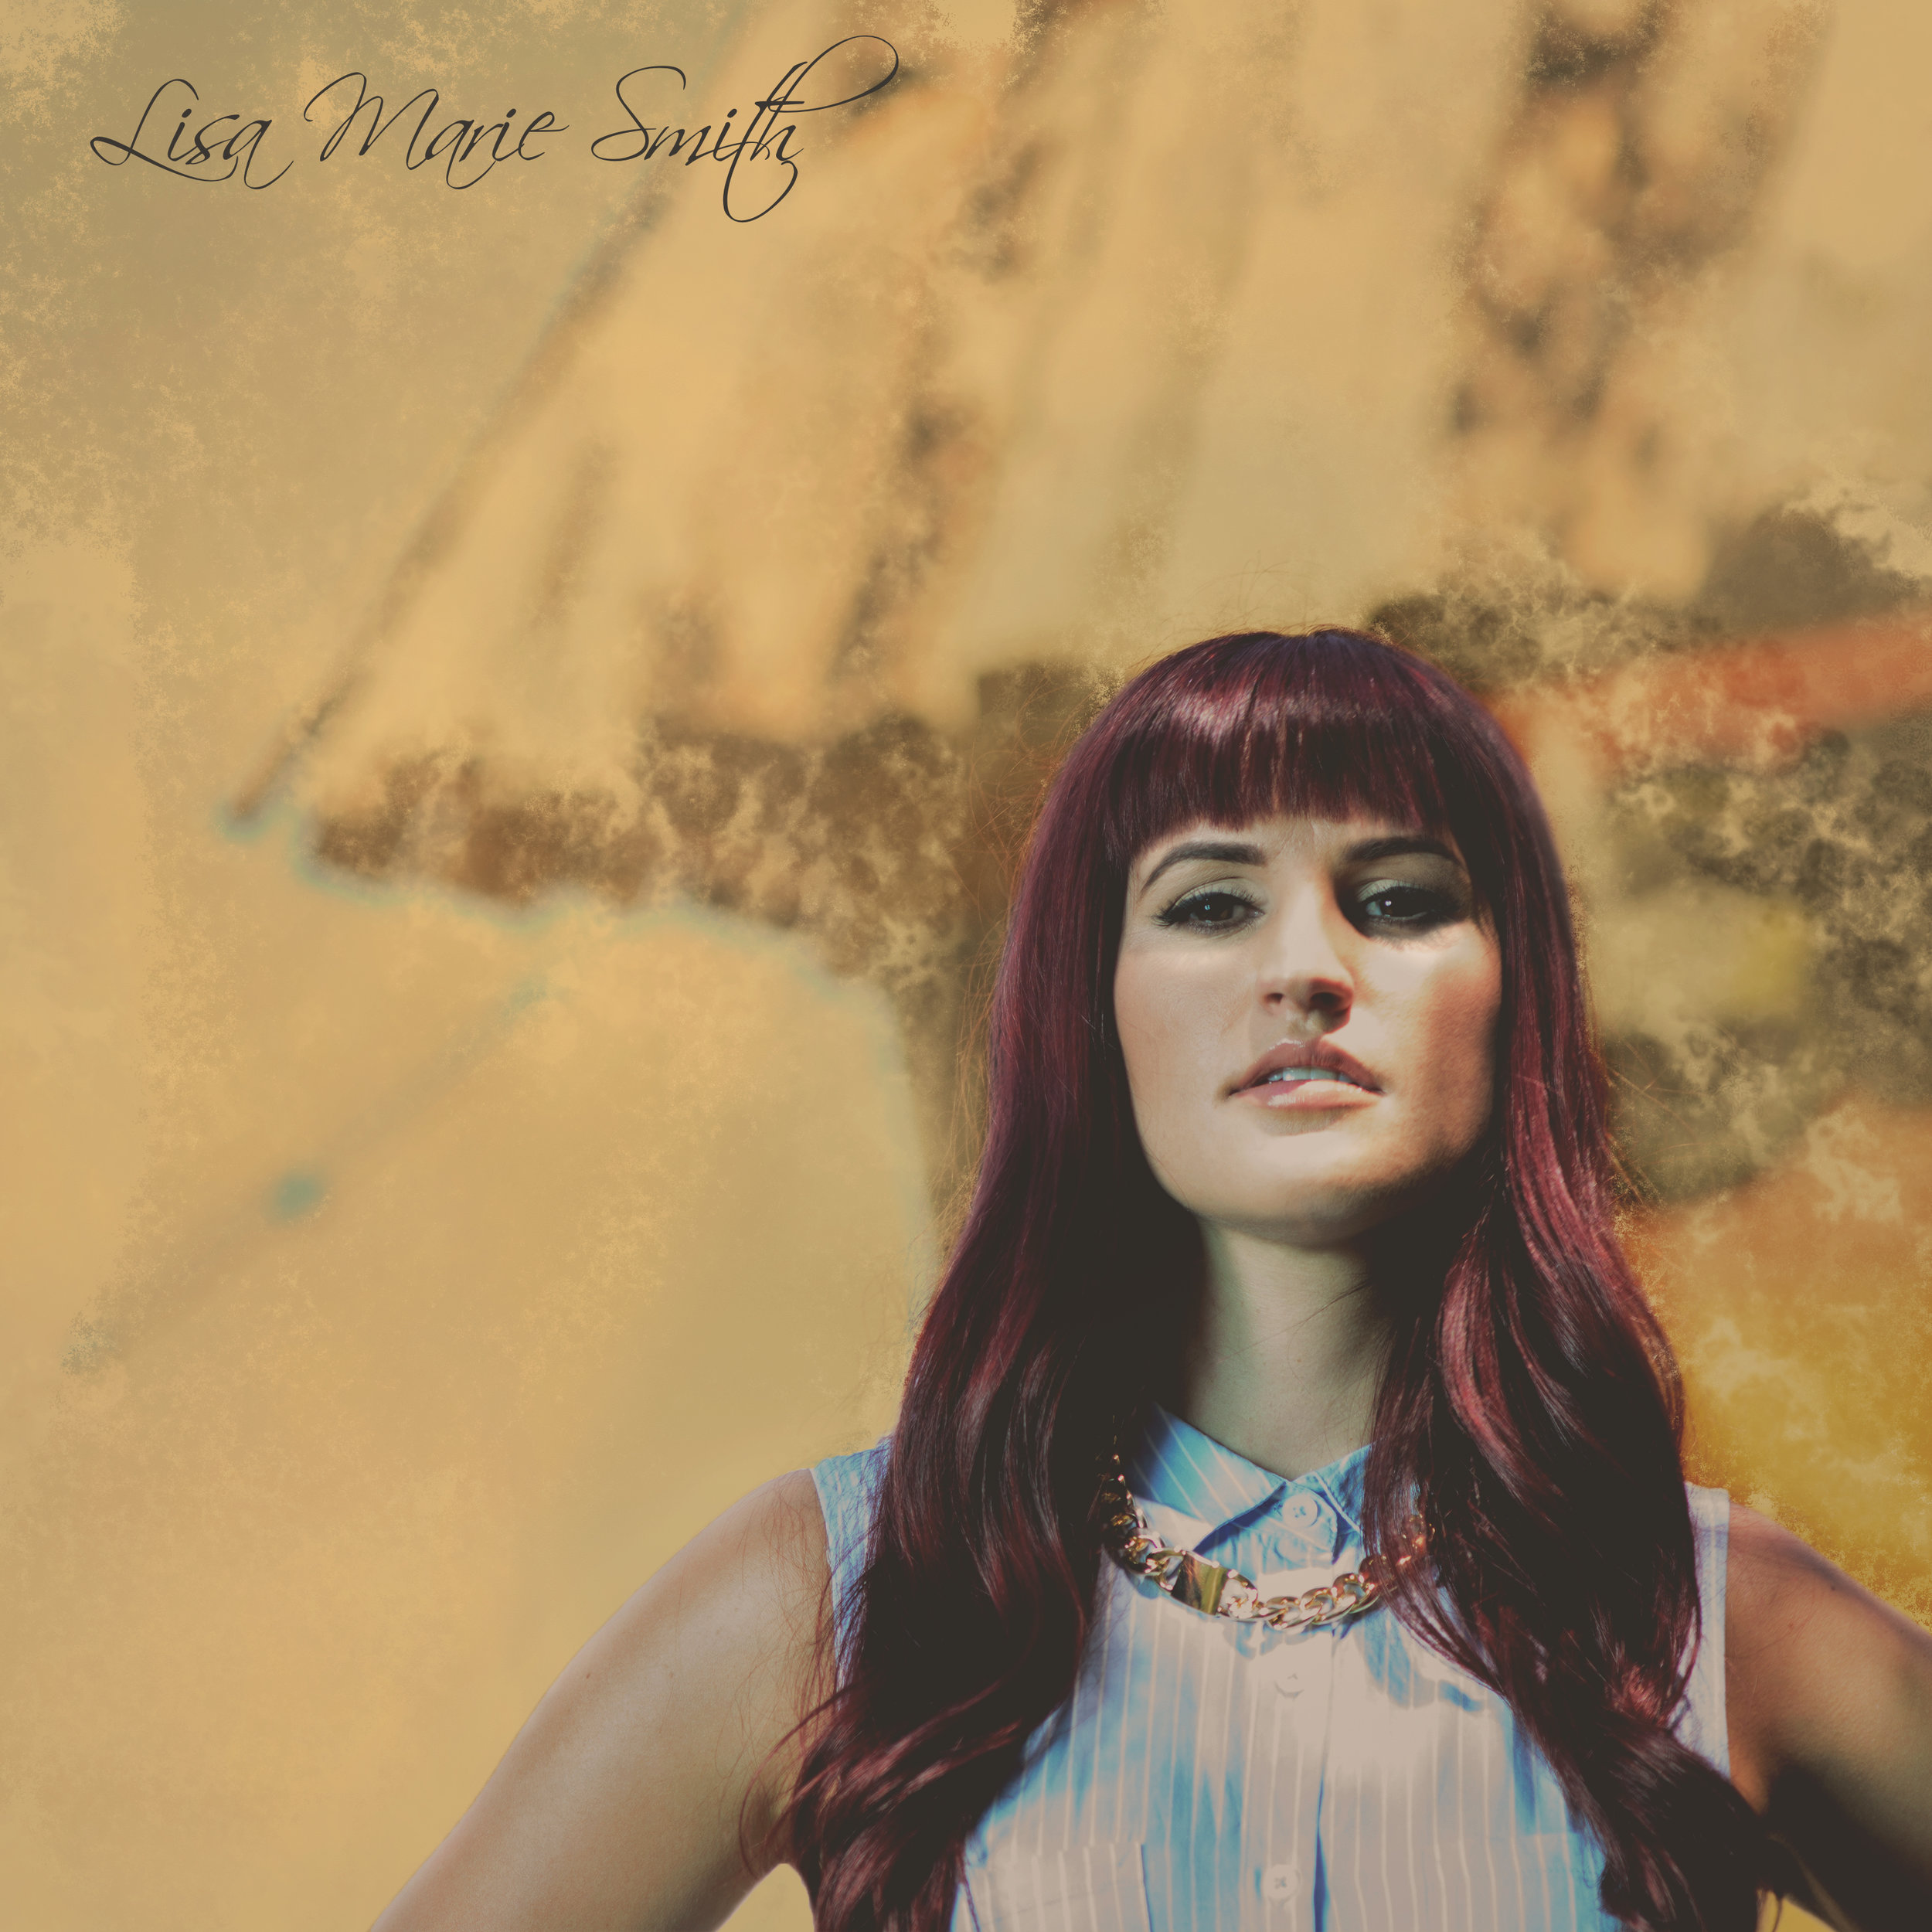 Lisa Marie Smith - s/t